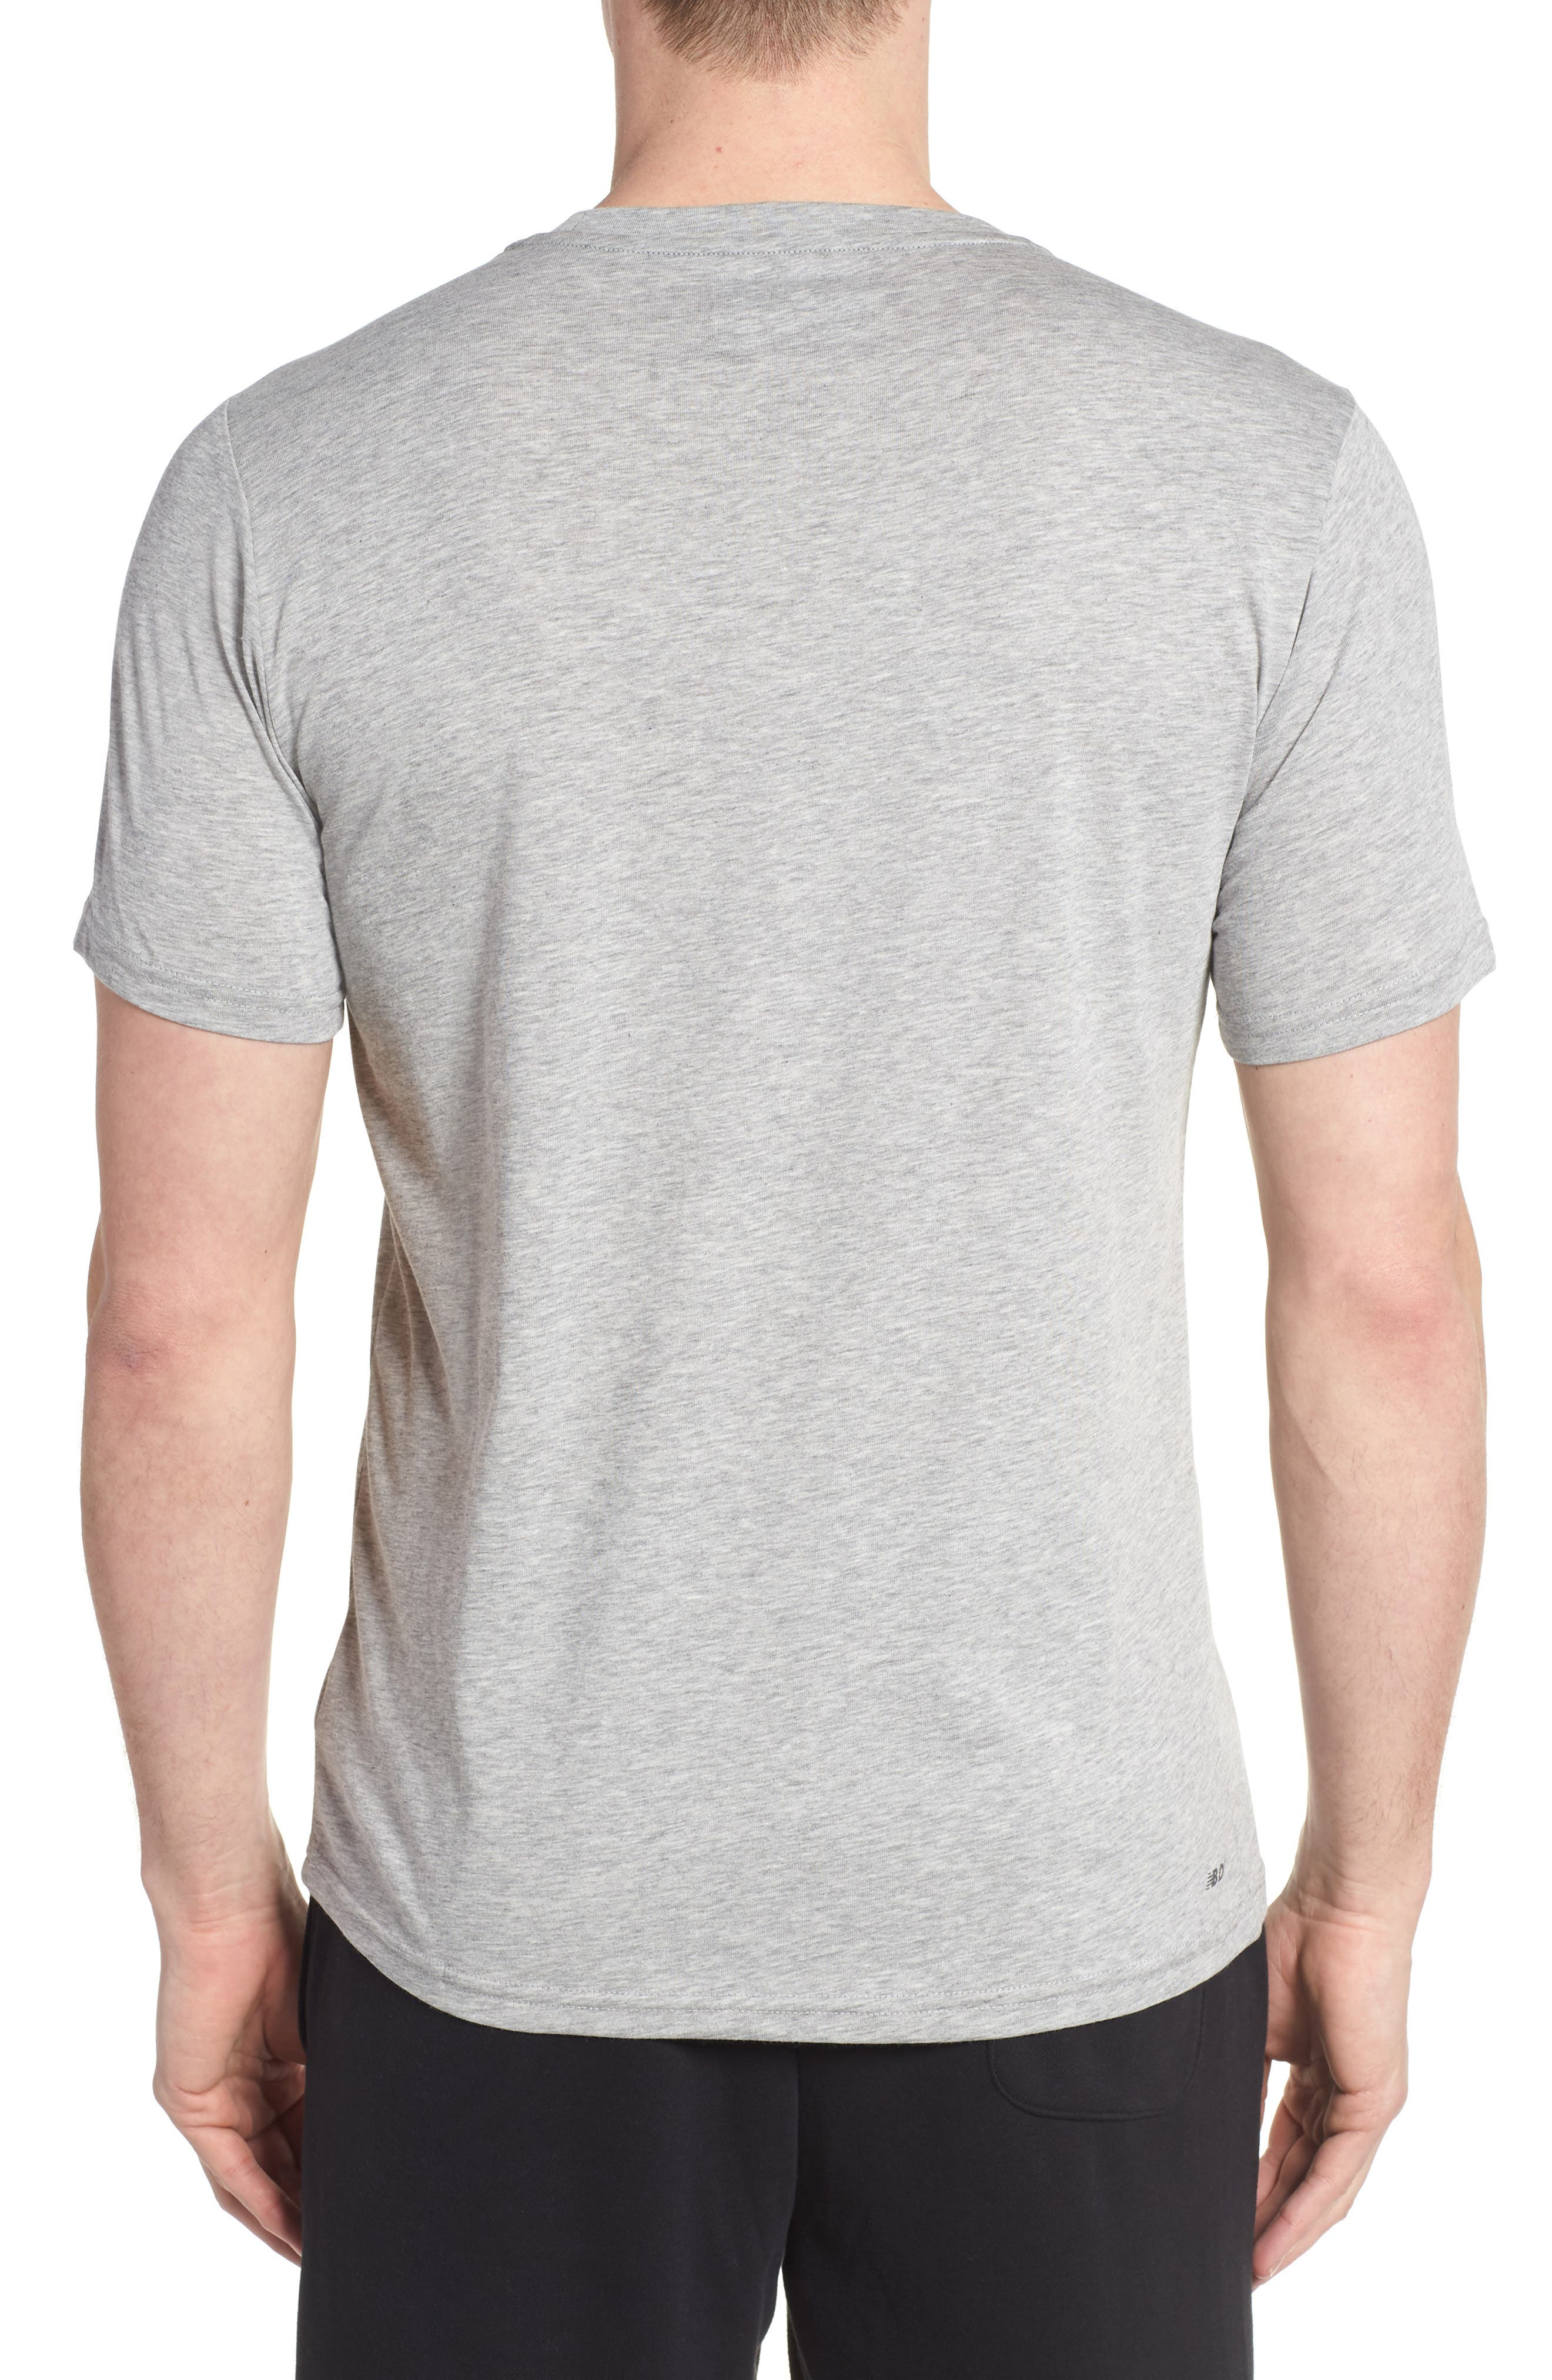 Heather Tech Crewneck T-Shirt,                             Alternate thumbnail 2, color,                             ATHLETIC GREY